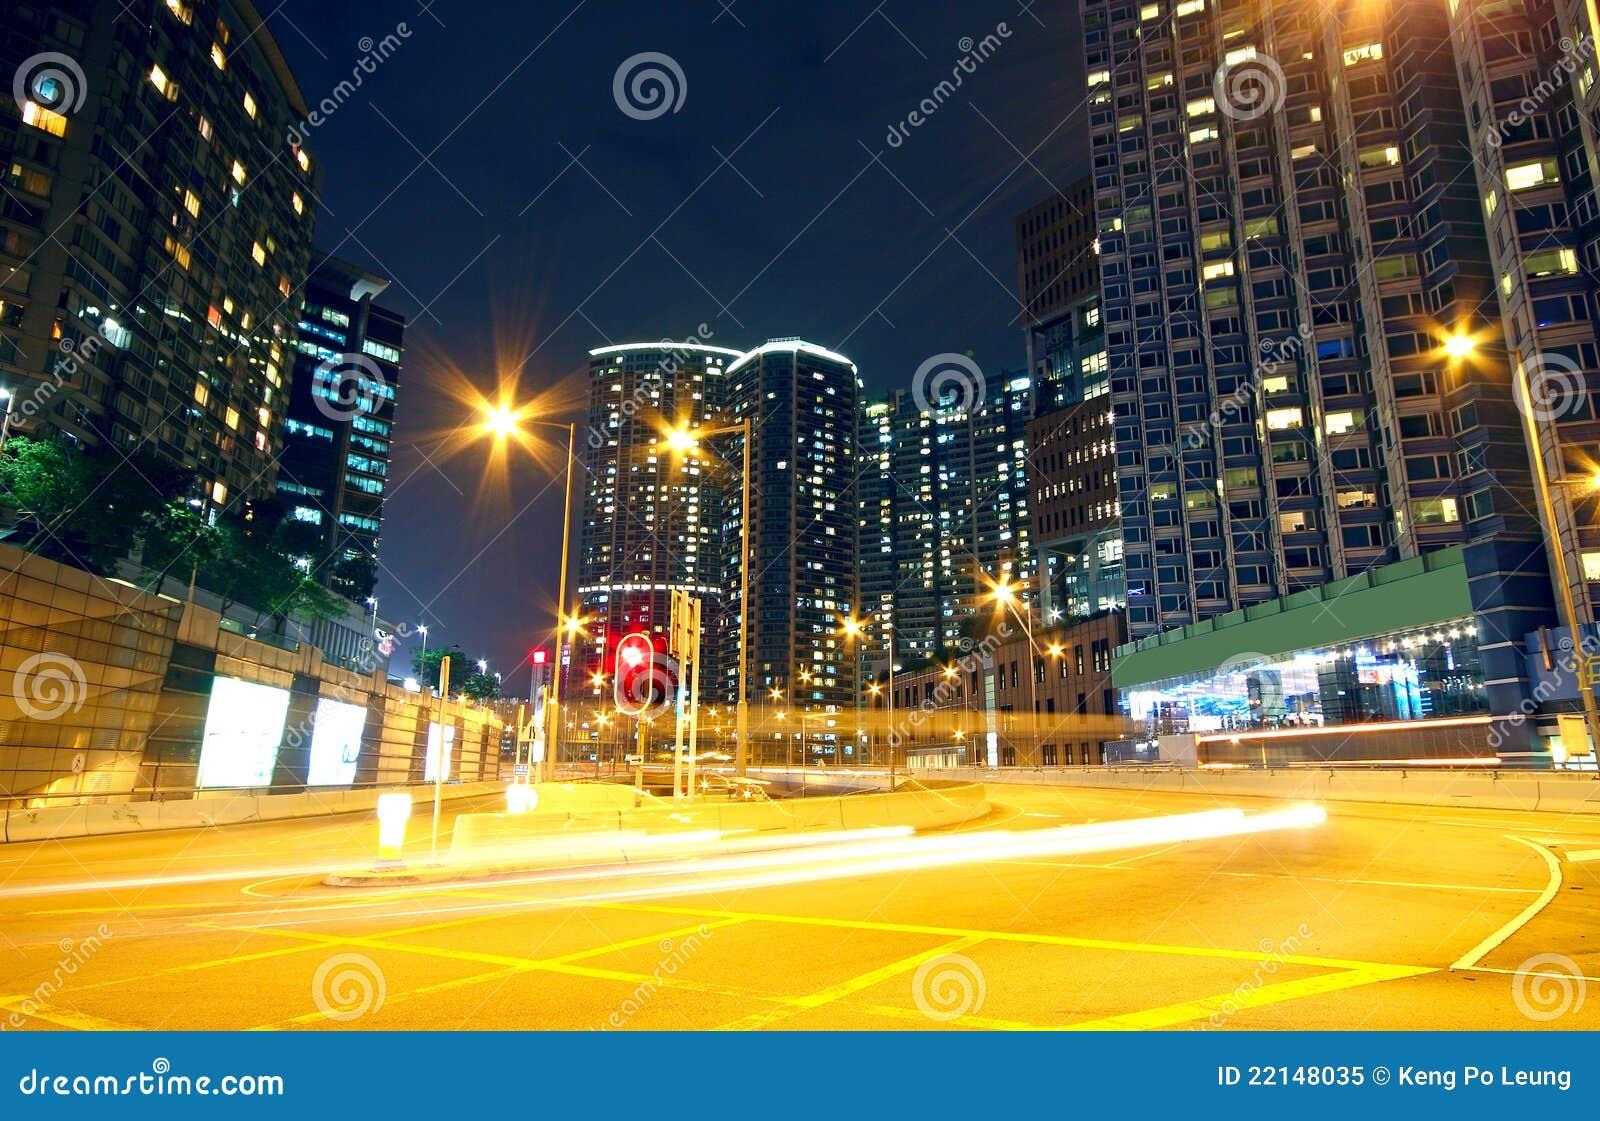 Urban Area At Night Urban Area At N...